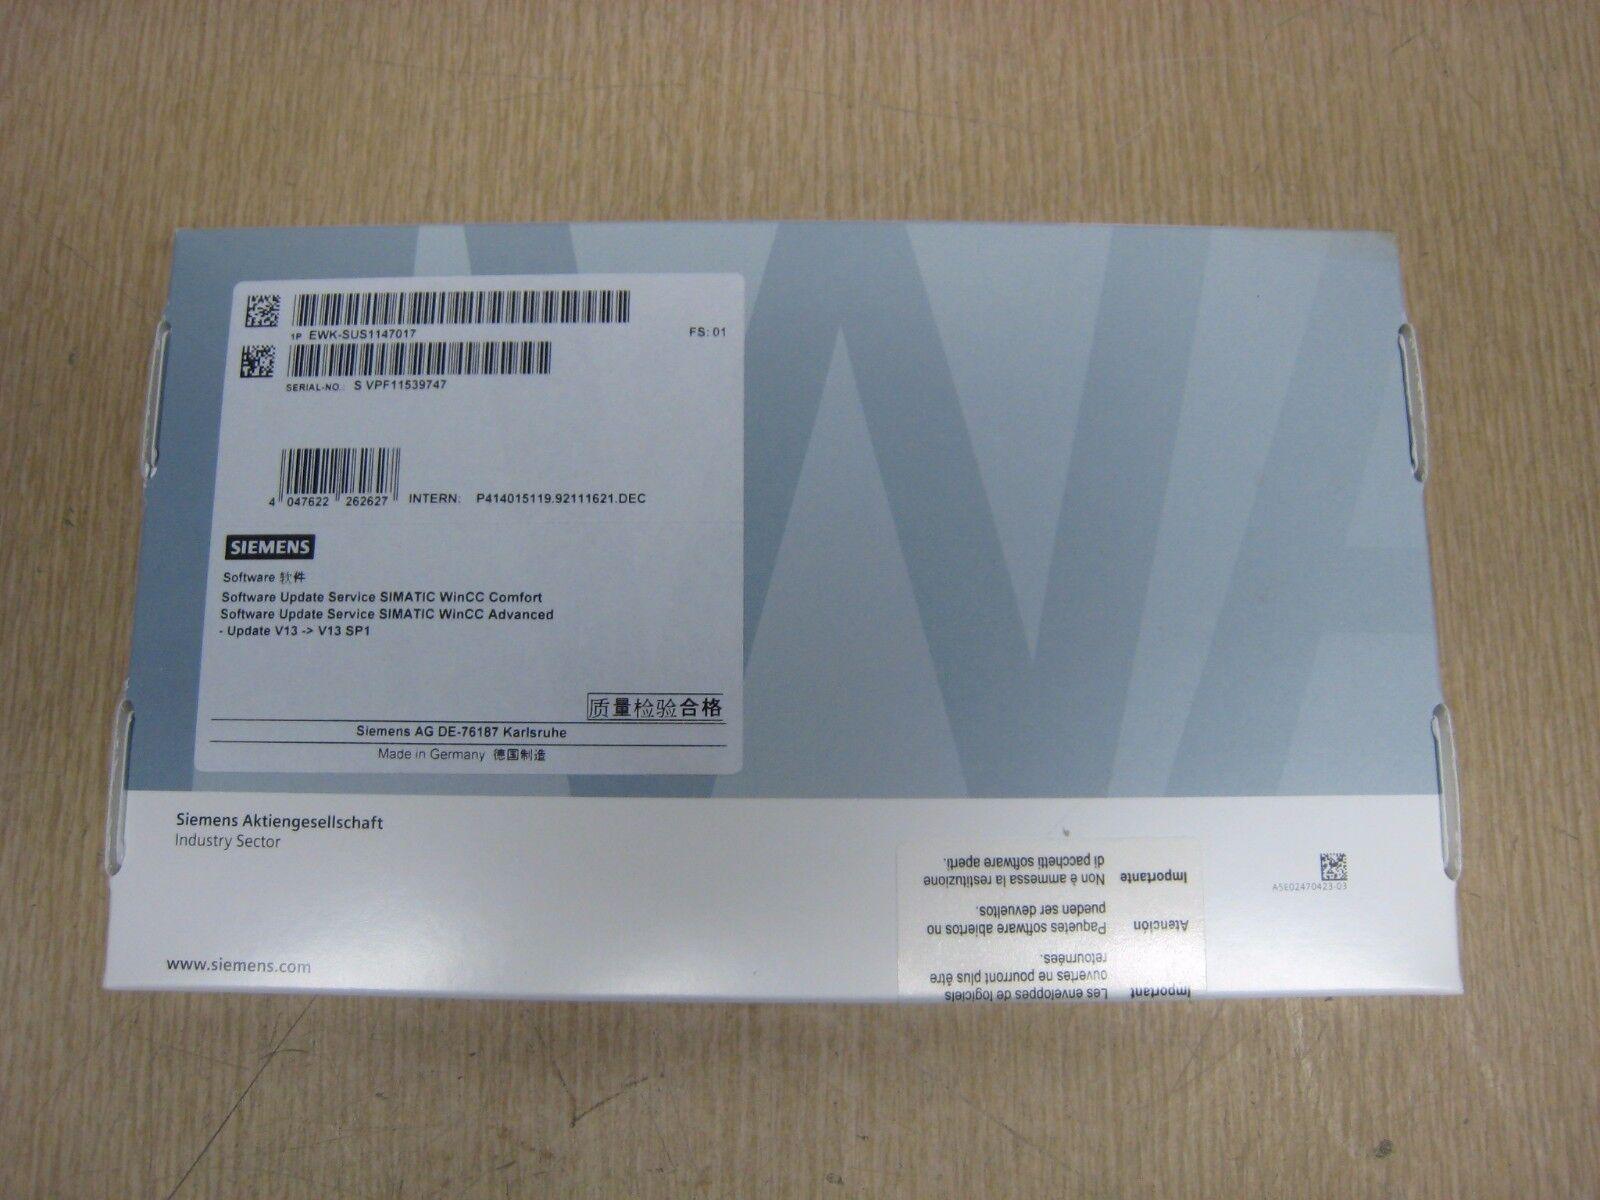 New Siemens EWK-SUS1147017 SIMATIC WinCC Comfort Advanced Upgrade Software